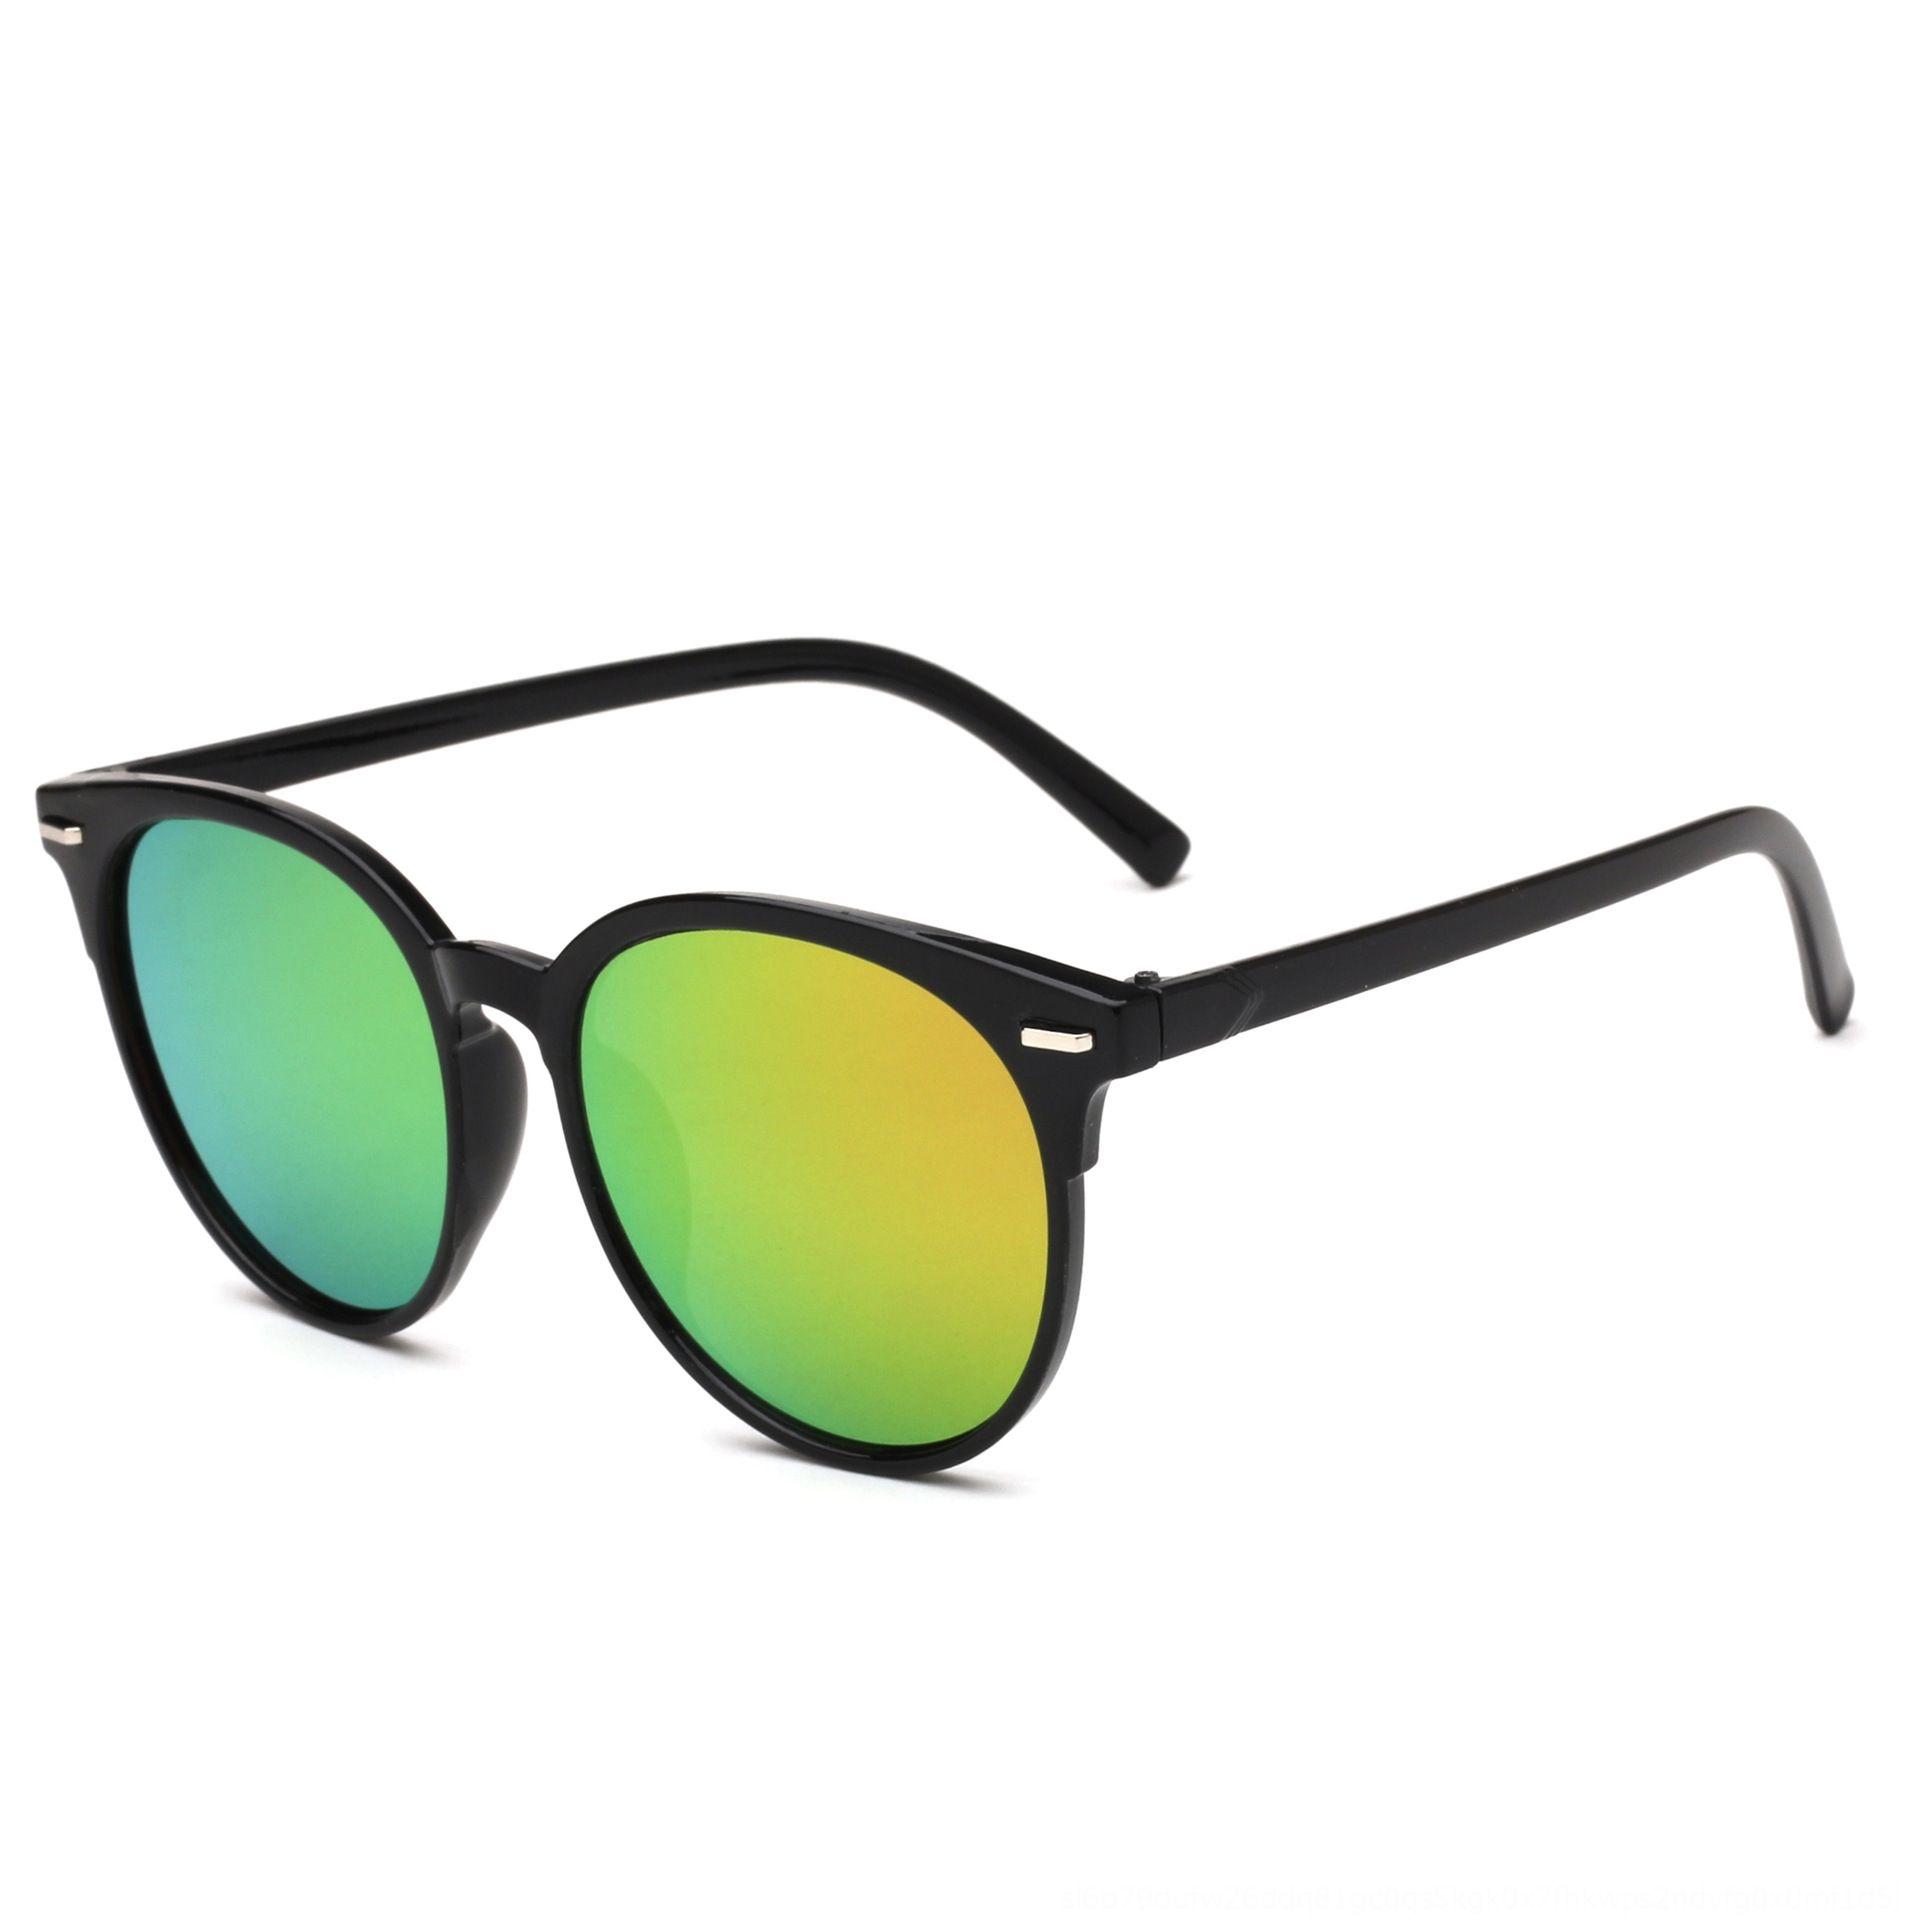 FvaJr L'oreo 15976 güneş gözlüğü Kore tarzı yeni erkek ve kadın güneş gözlüğü güneş gözlüğü